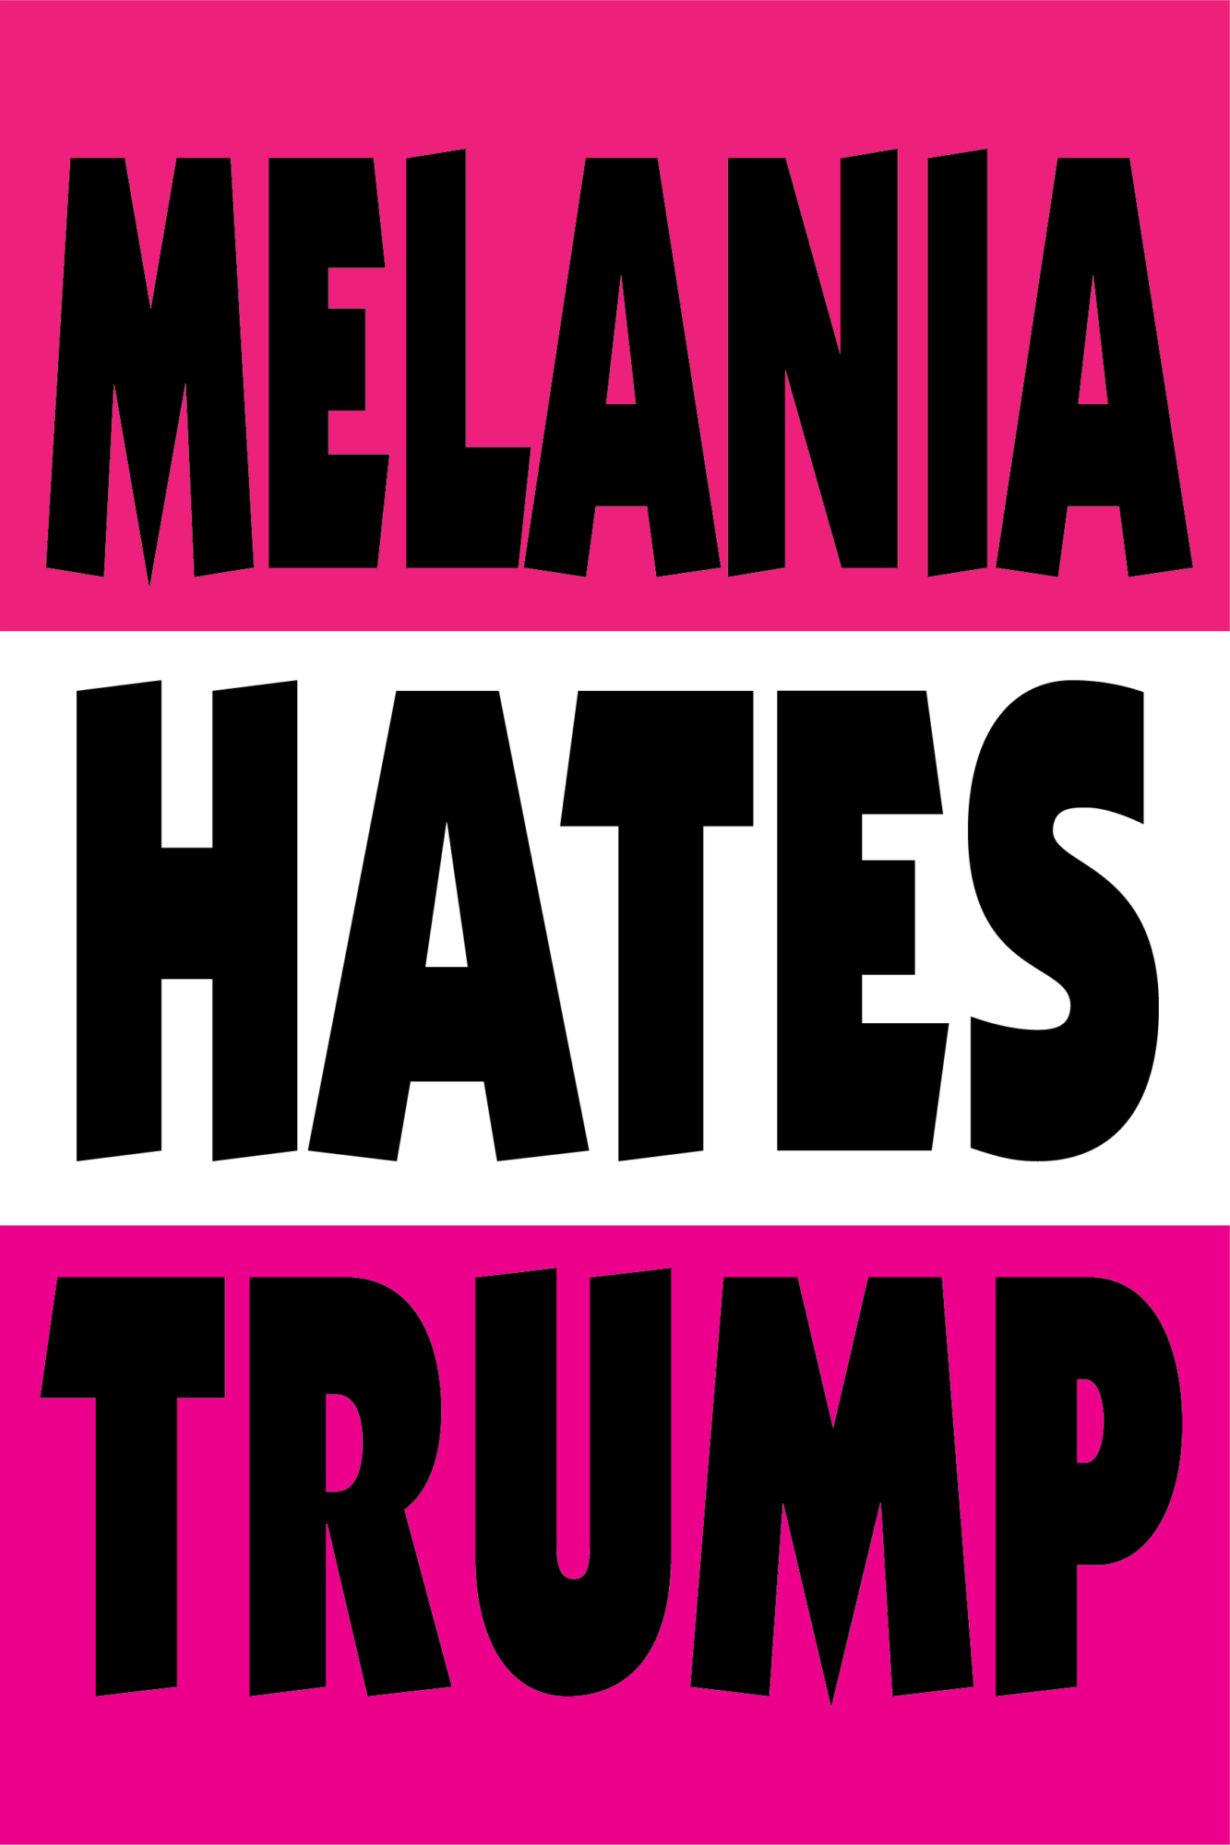 NP_26_50_2017_Melania-Hates-Trump.jpg